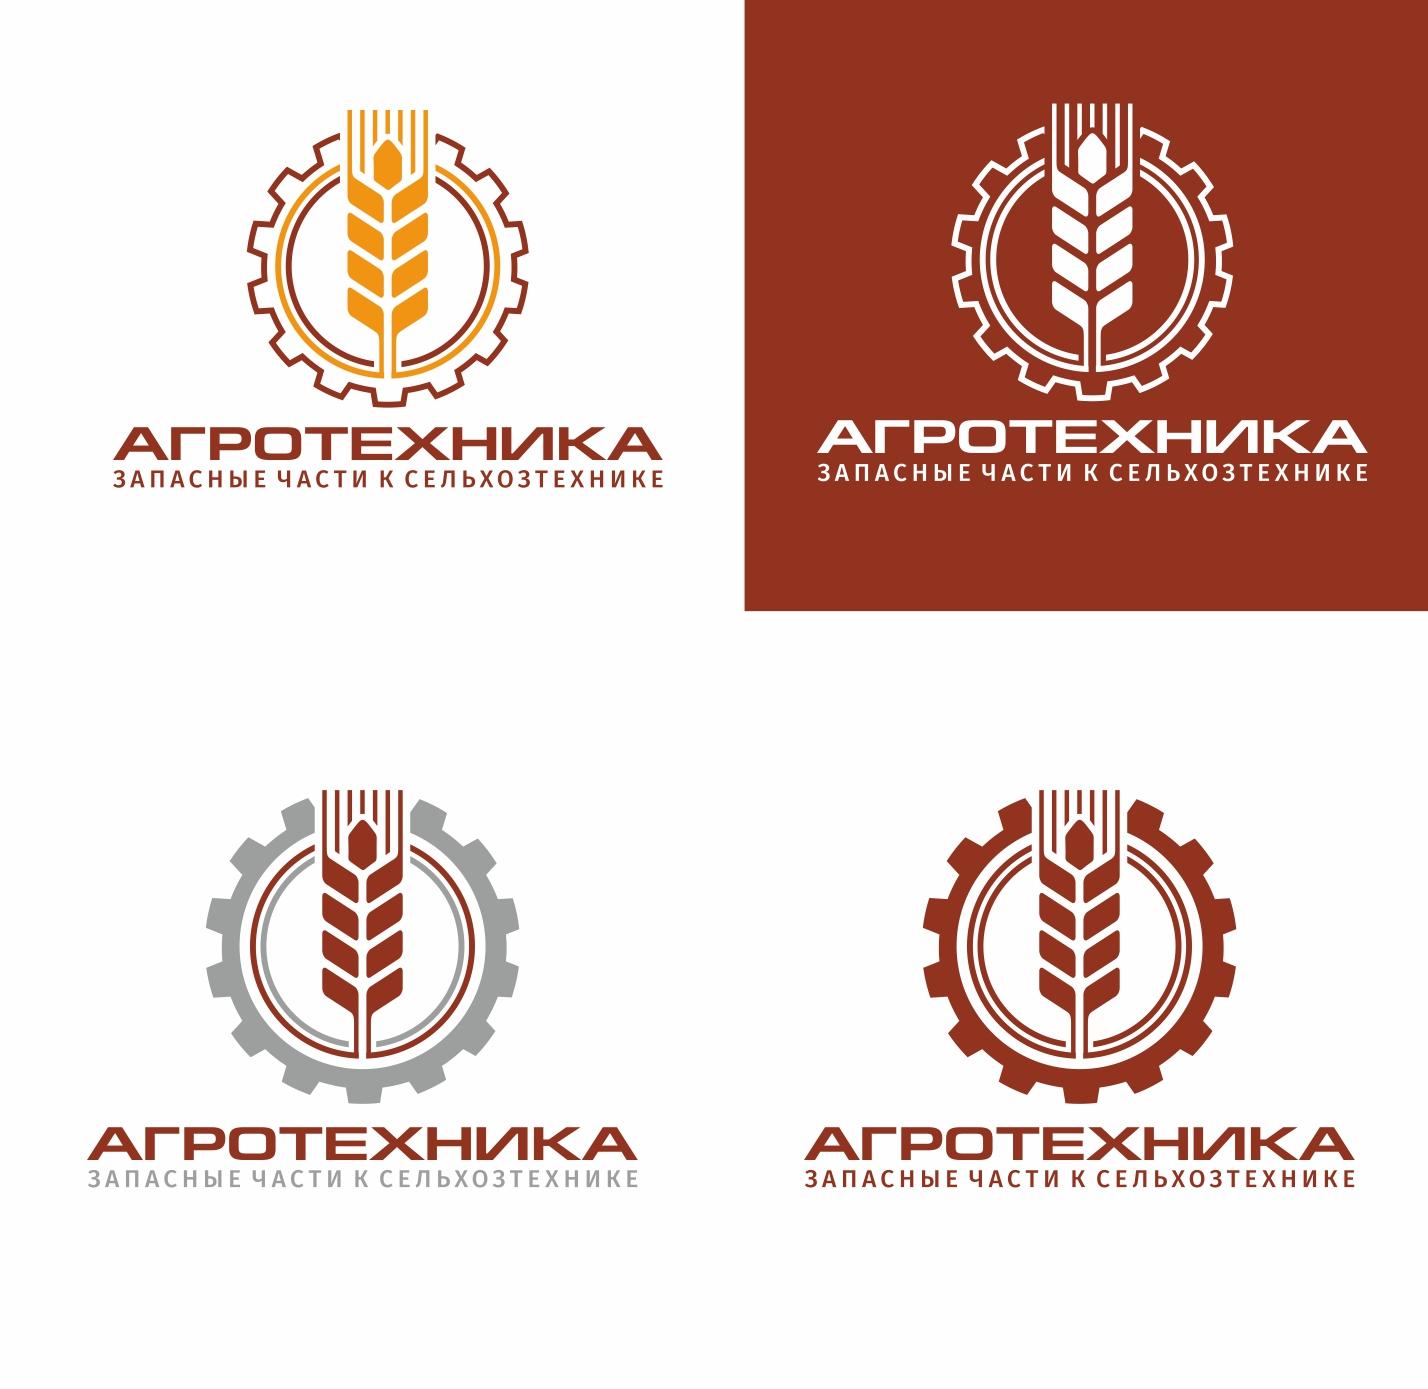 Разработка логотипа для компании Агротехника фото f_8075c067ffa0bda9.jpg